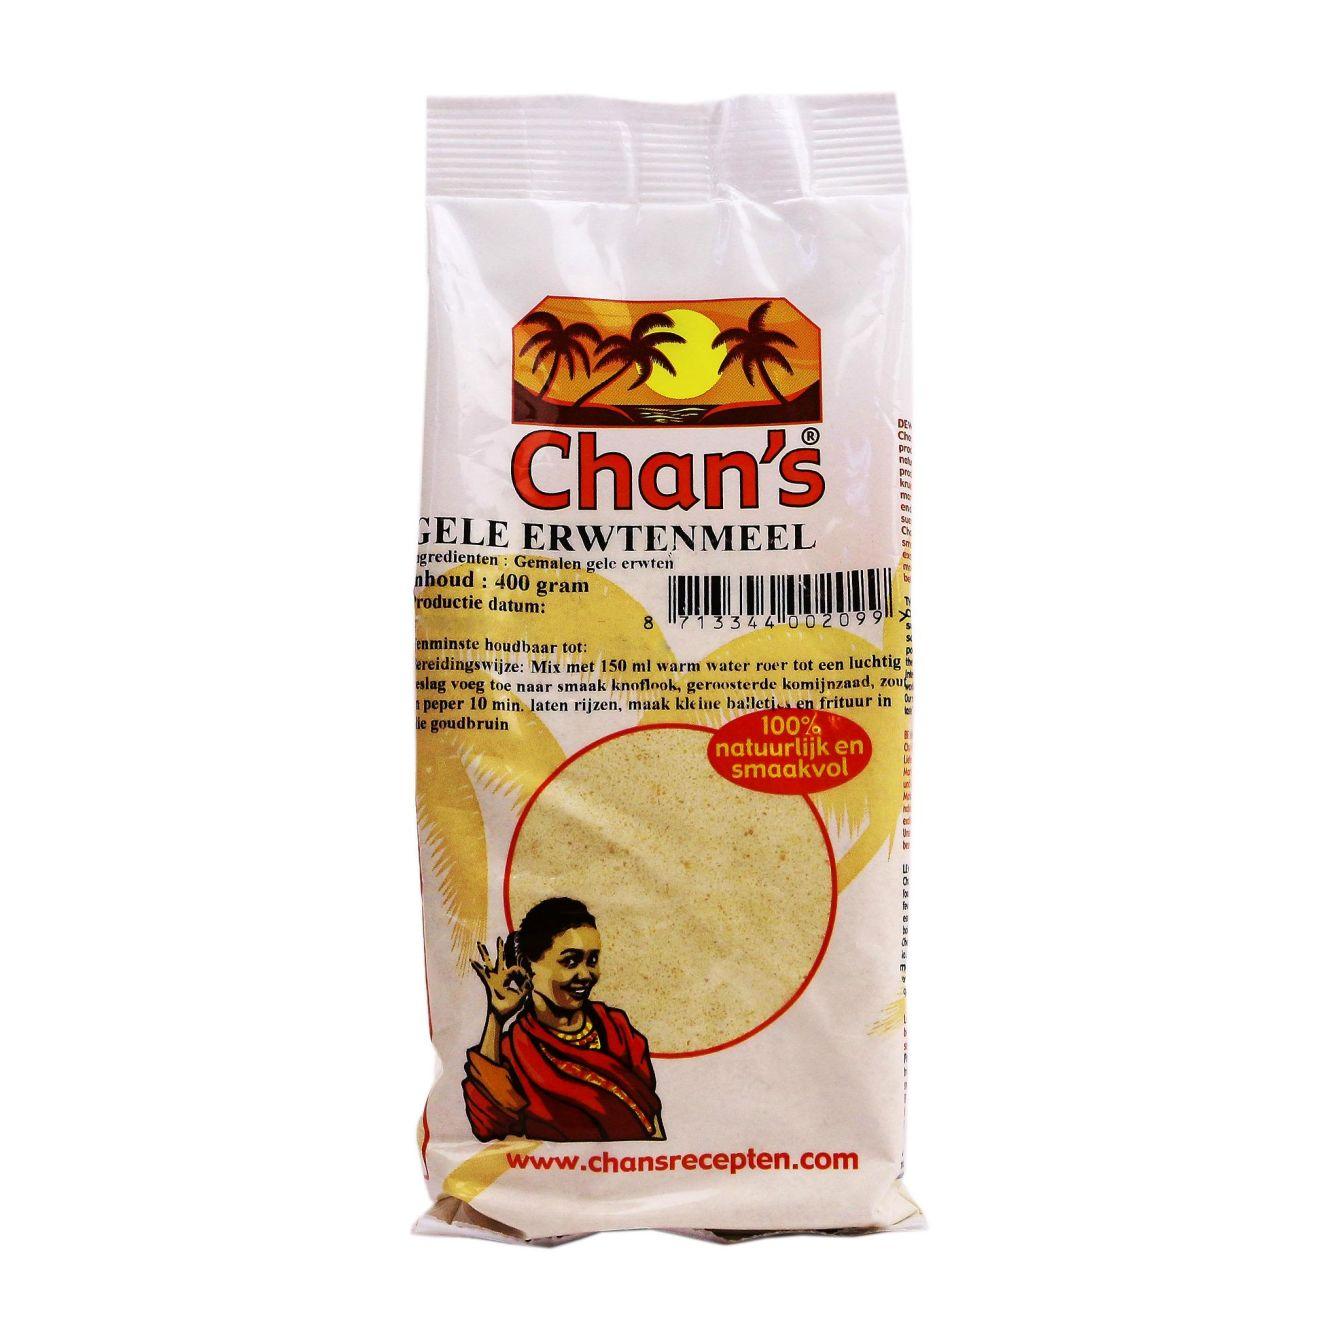 Chan's Gele Erwtenmeel